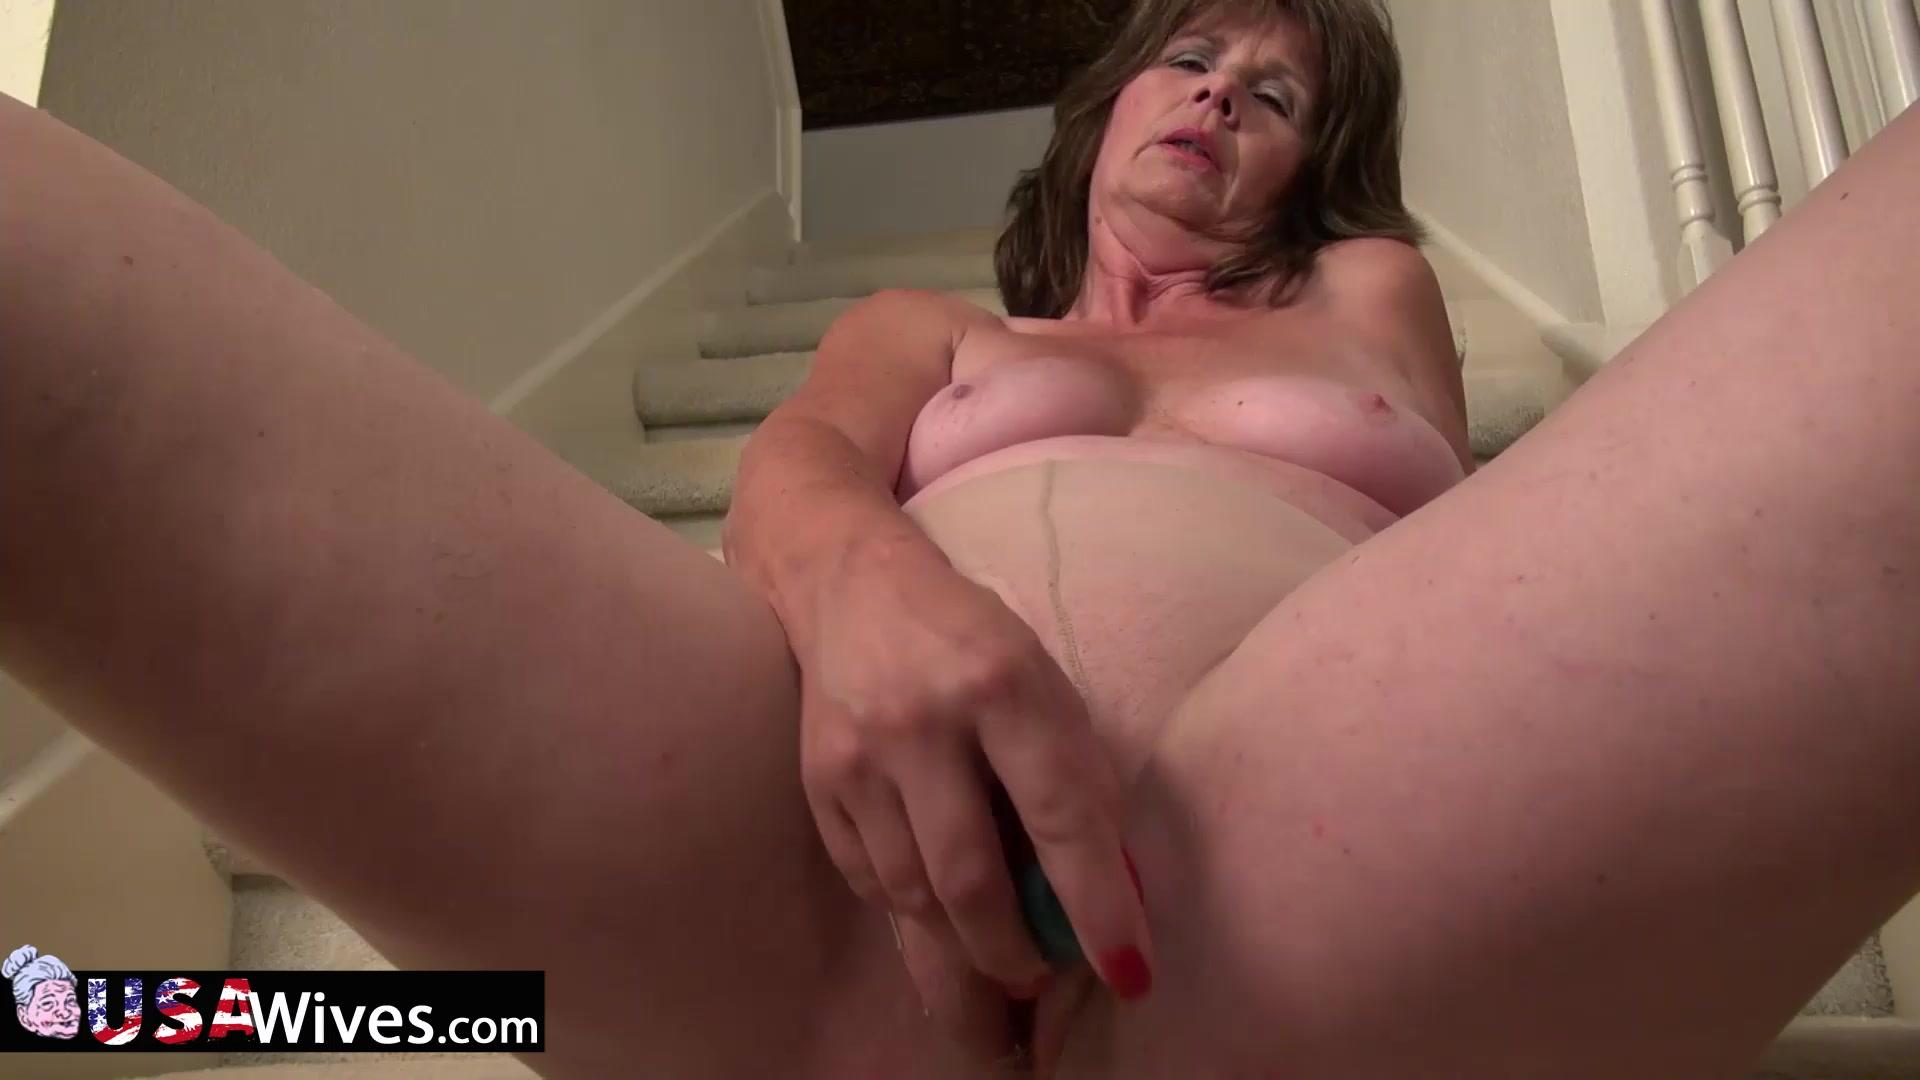 Hot Naked Pics Sex photo naked